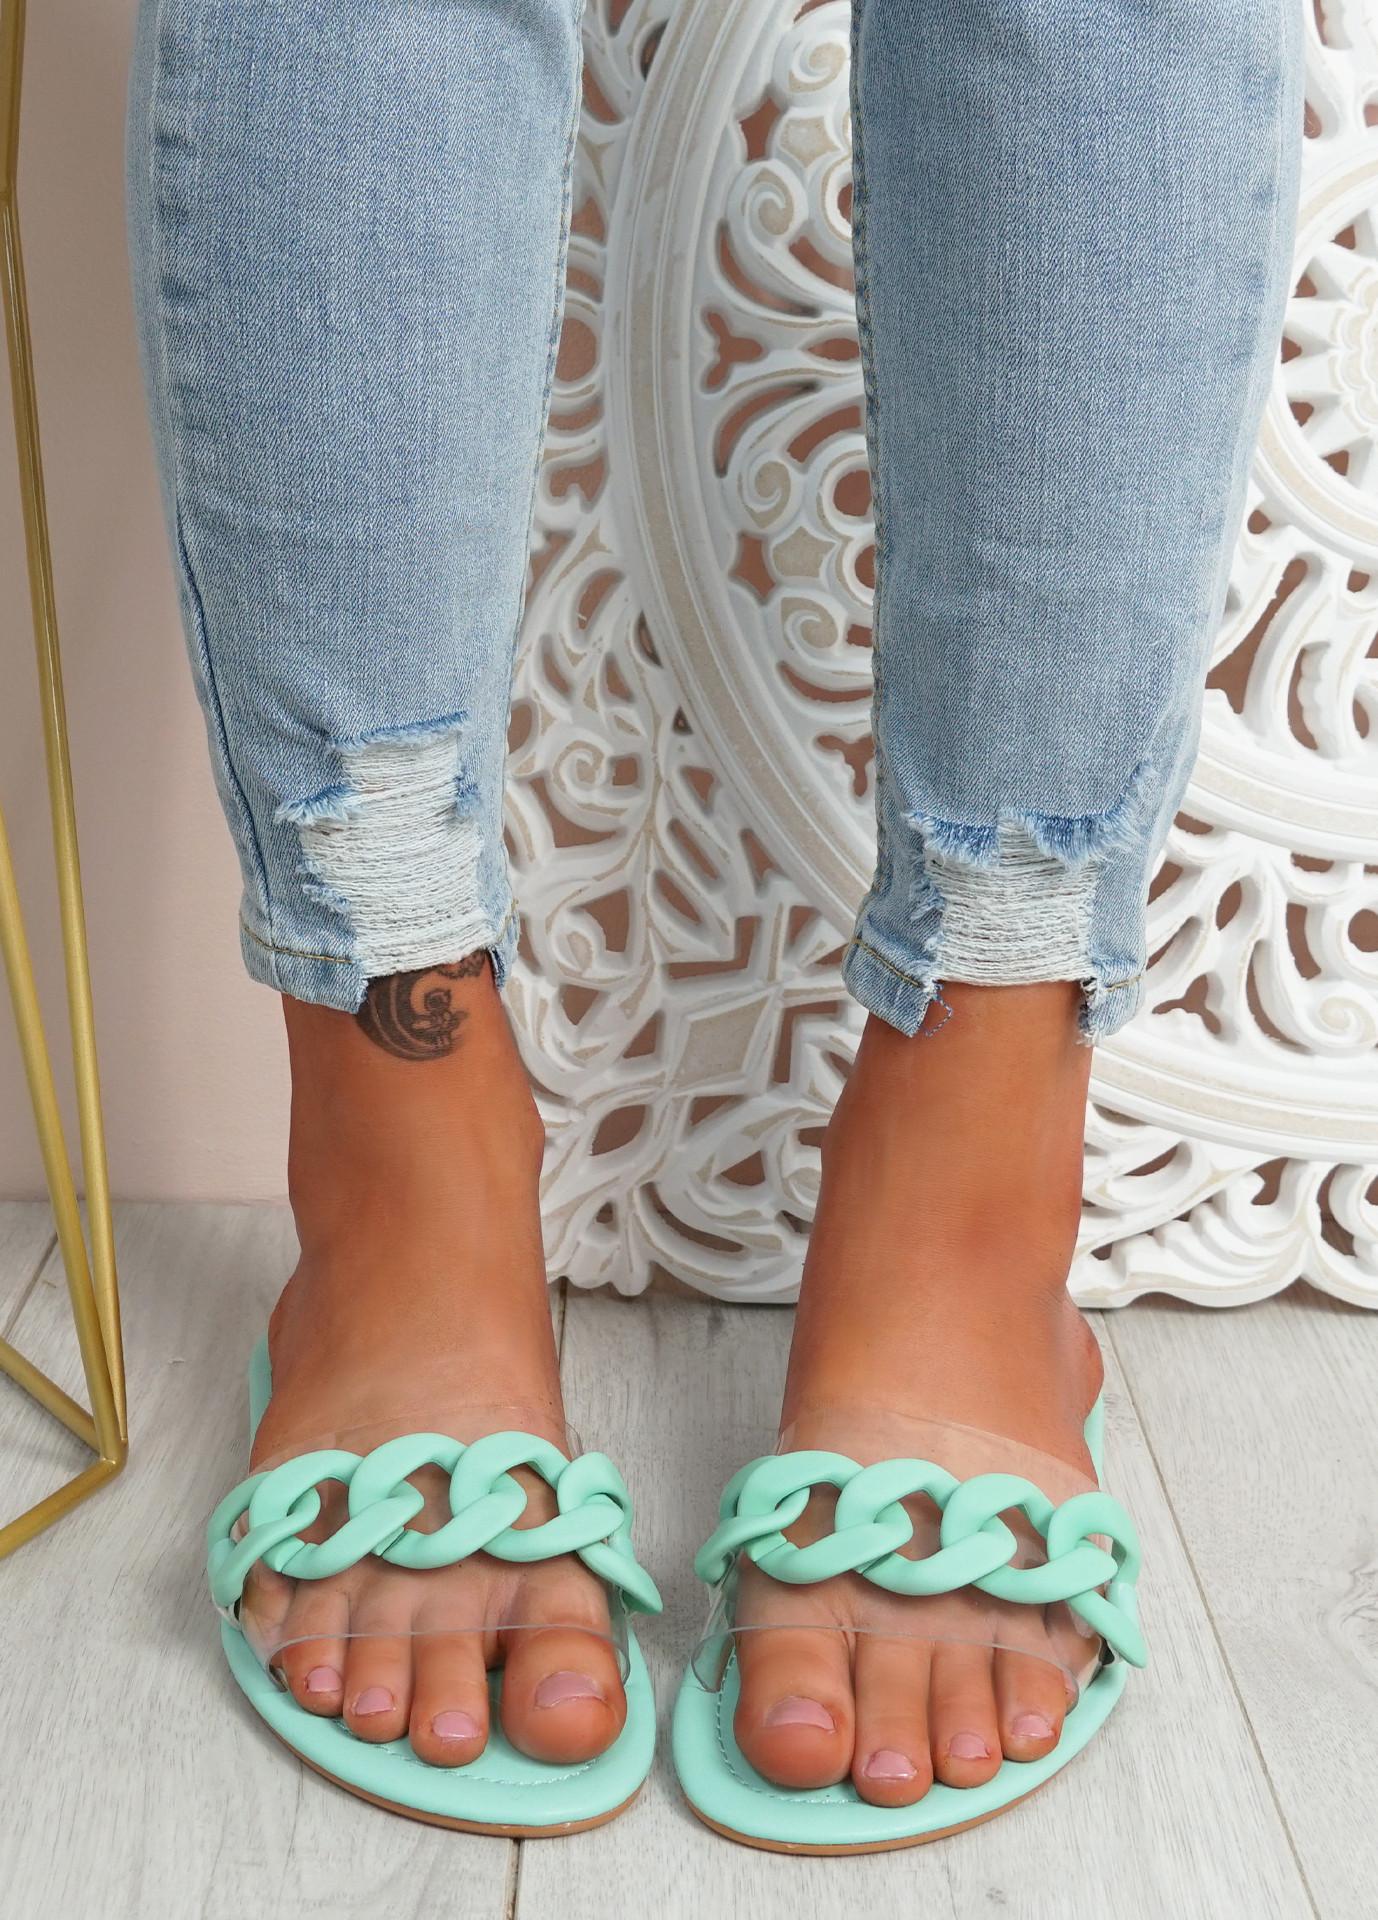 Vemma Green Slip On Flat Sandals